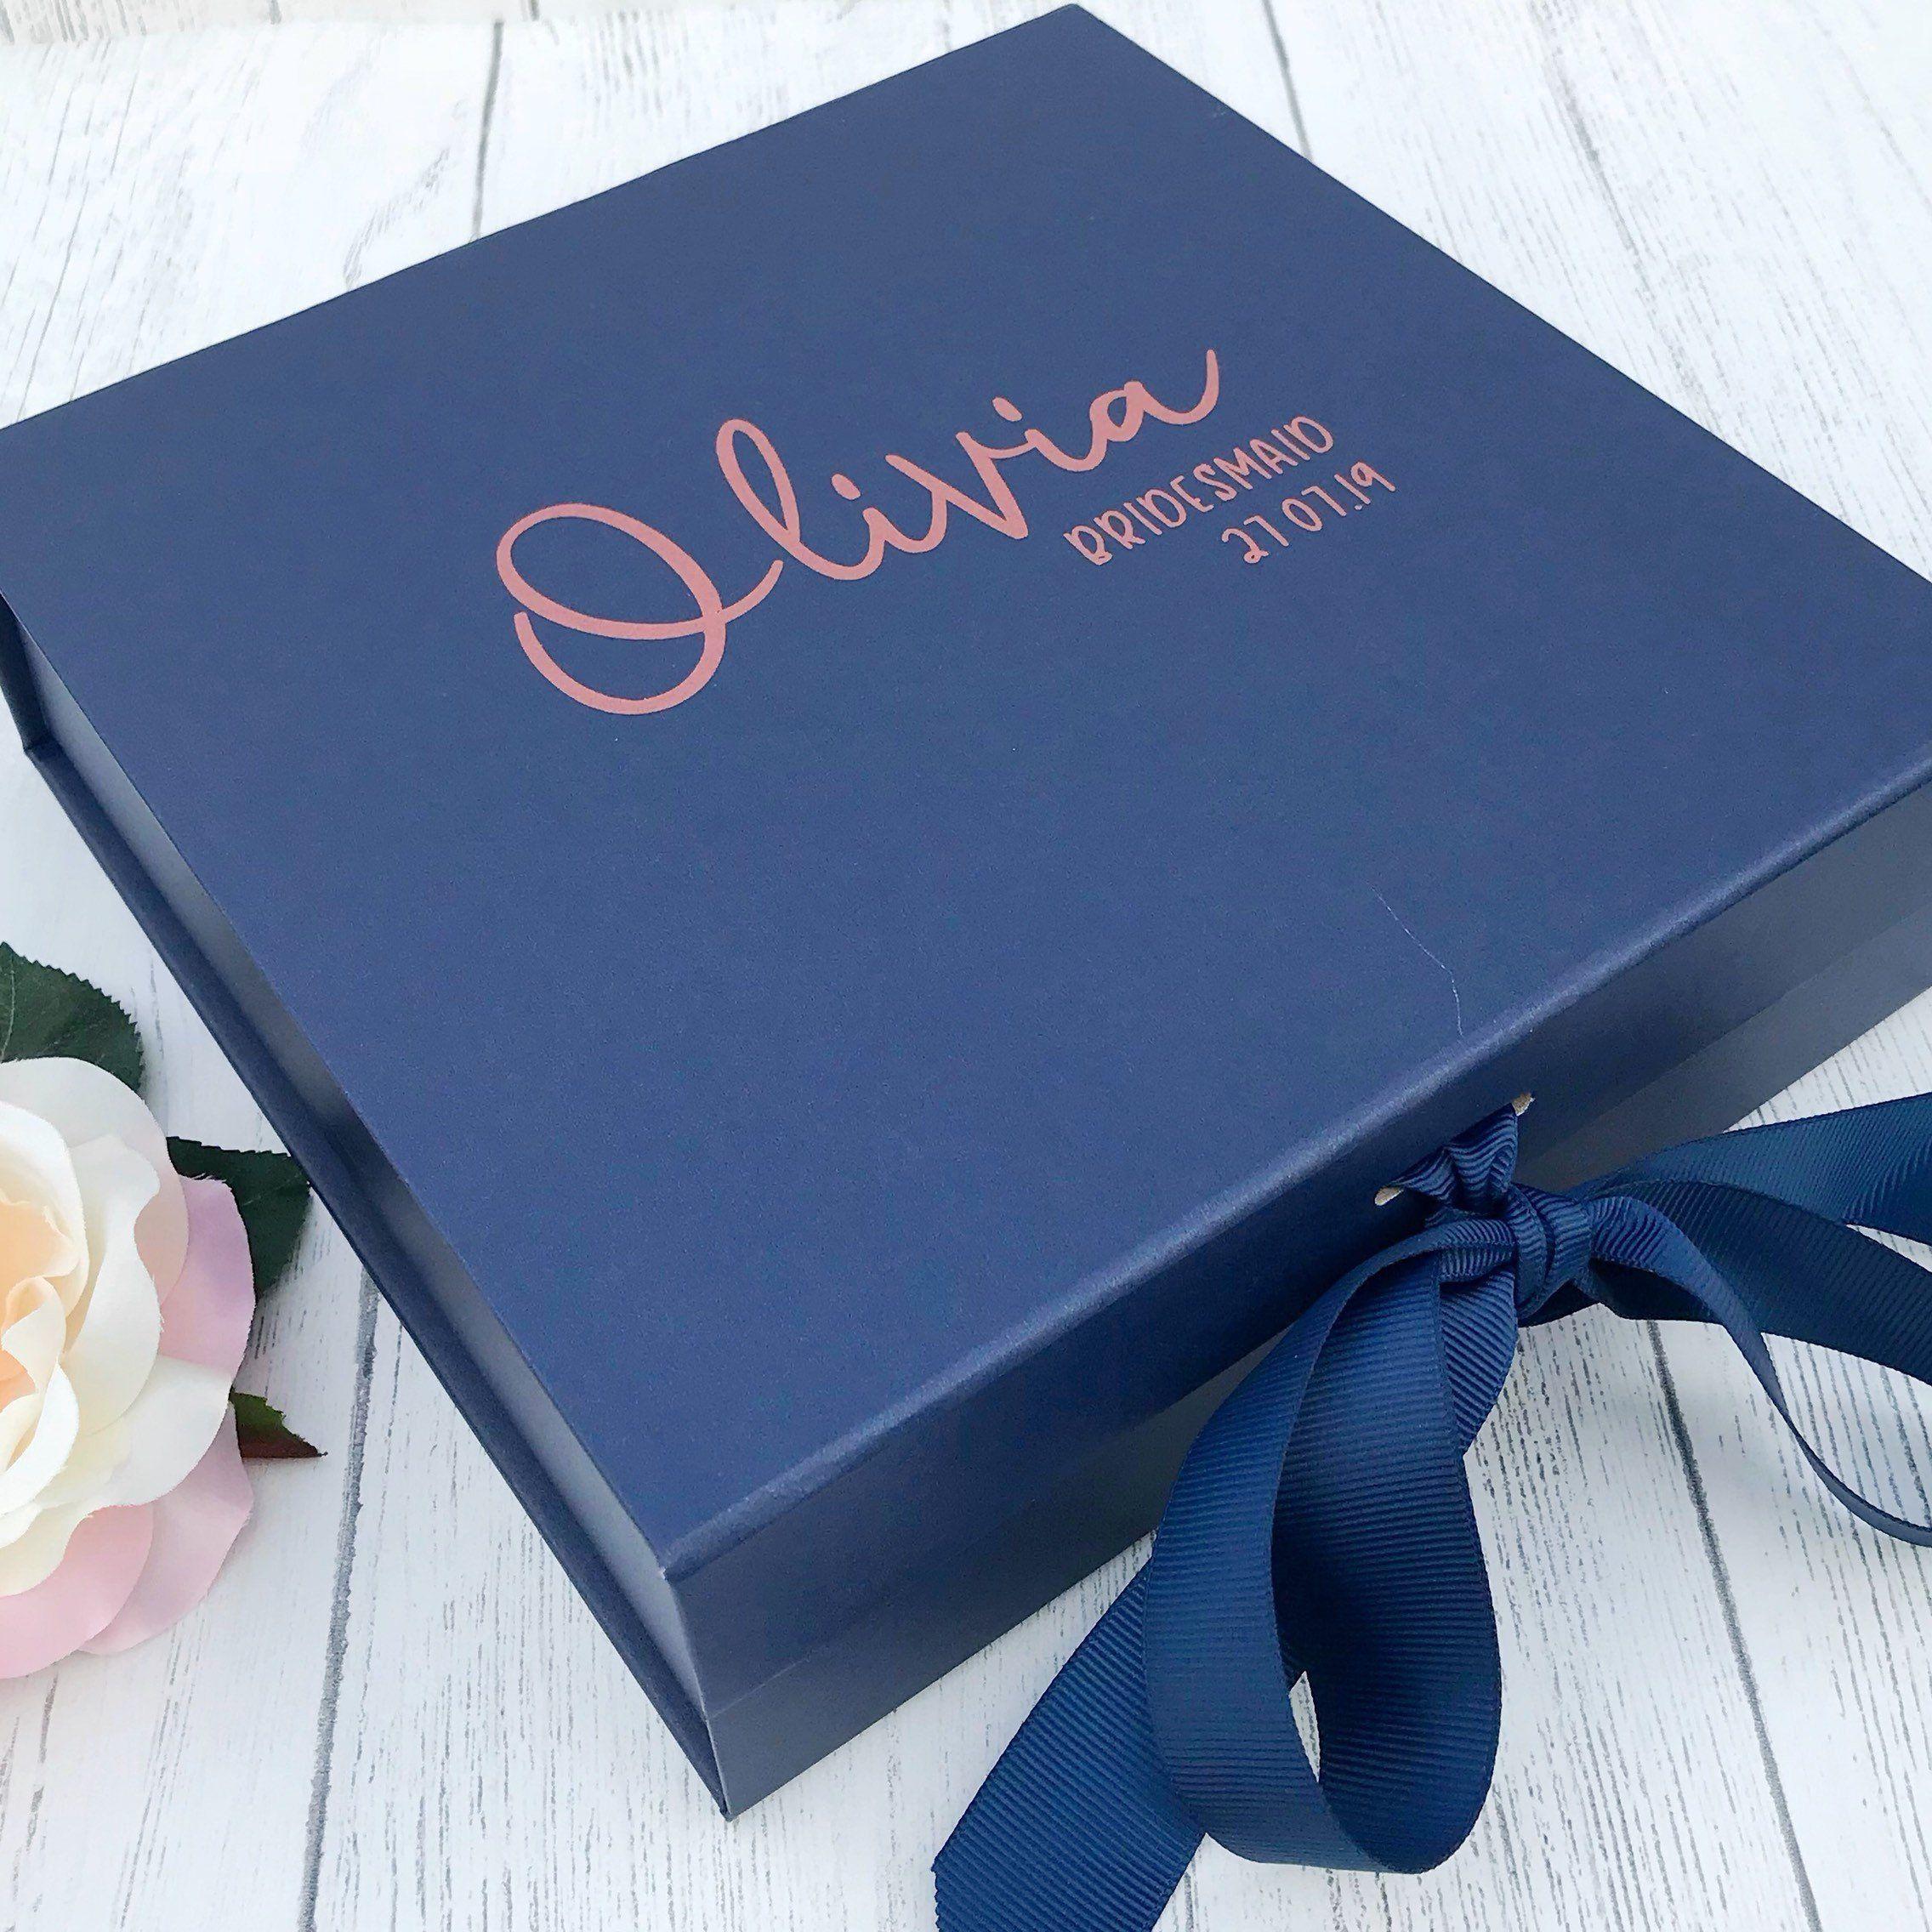 SILVER PERSONALISED MEDIUM GIFT BOX CHRISTMAS BIRTHDAY BRIDE BRIDESMAID GROOM